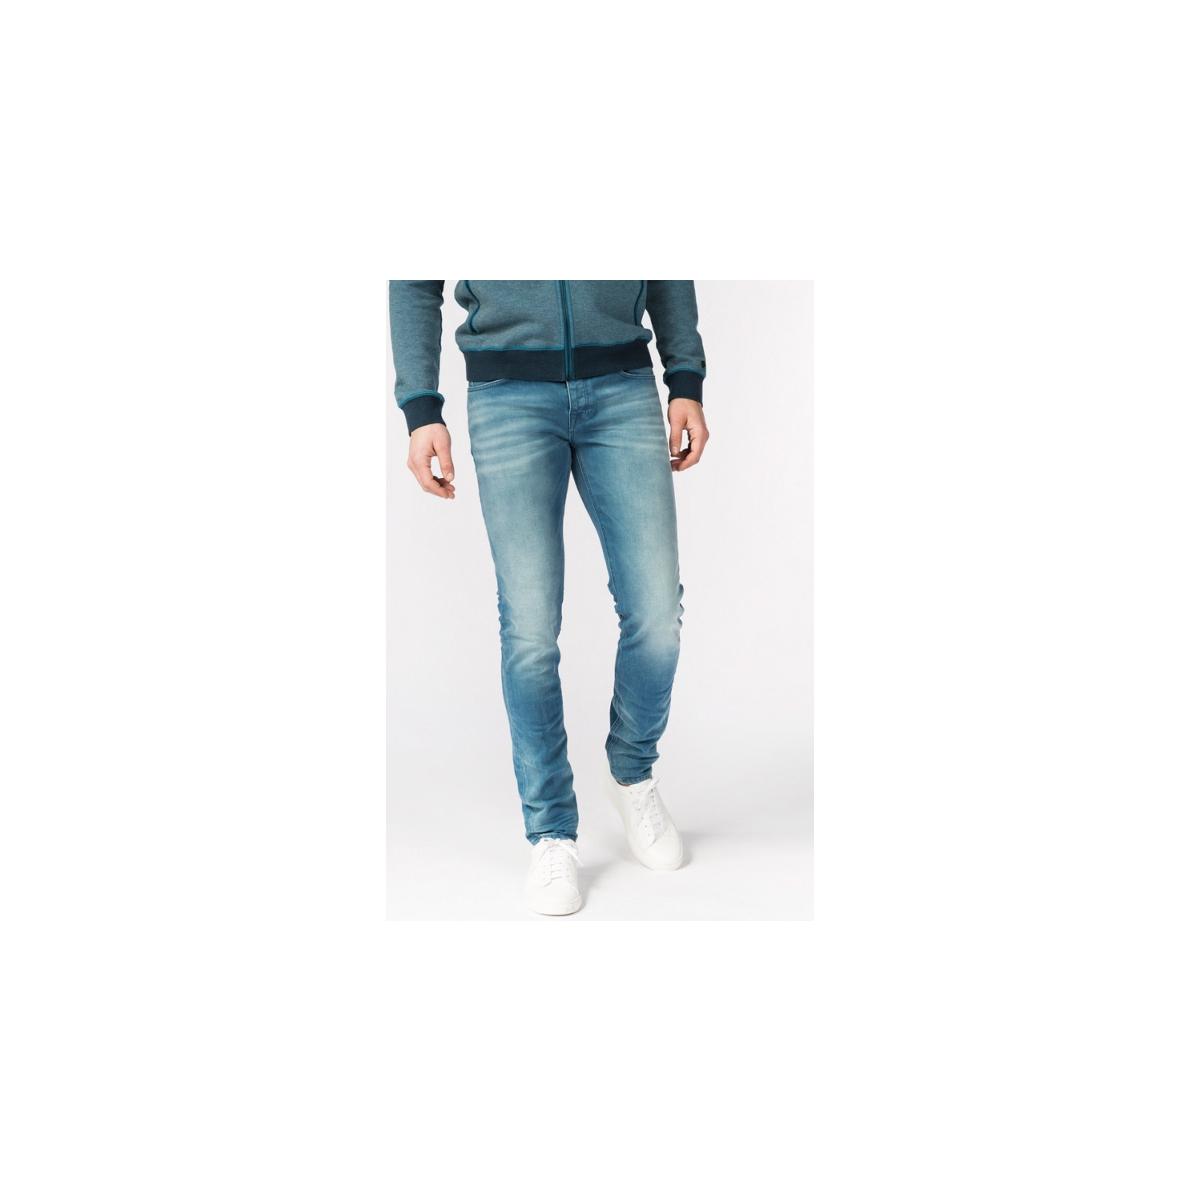 ctr181205 cast iron jeans sgt